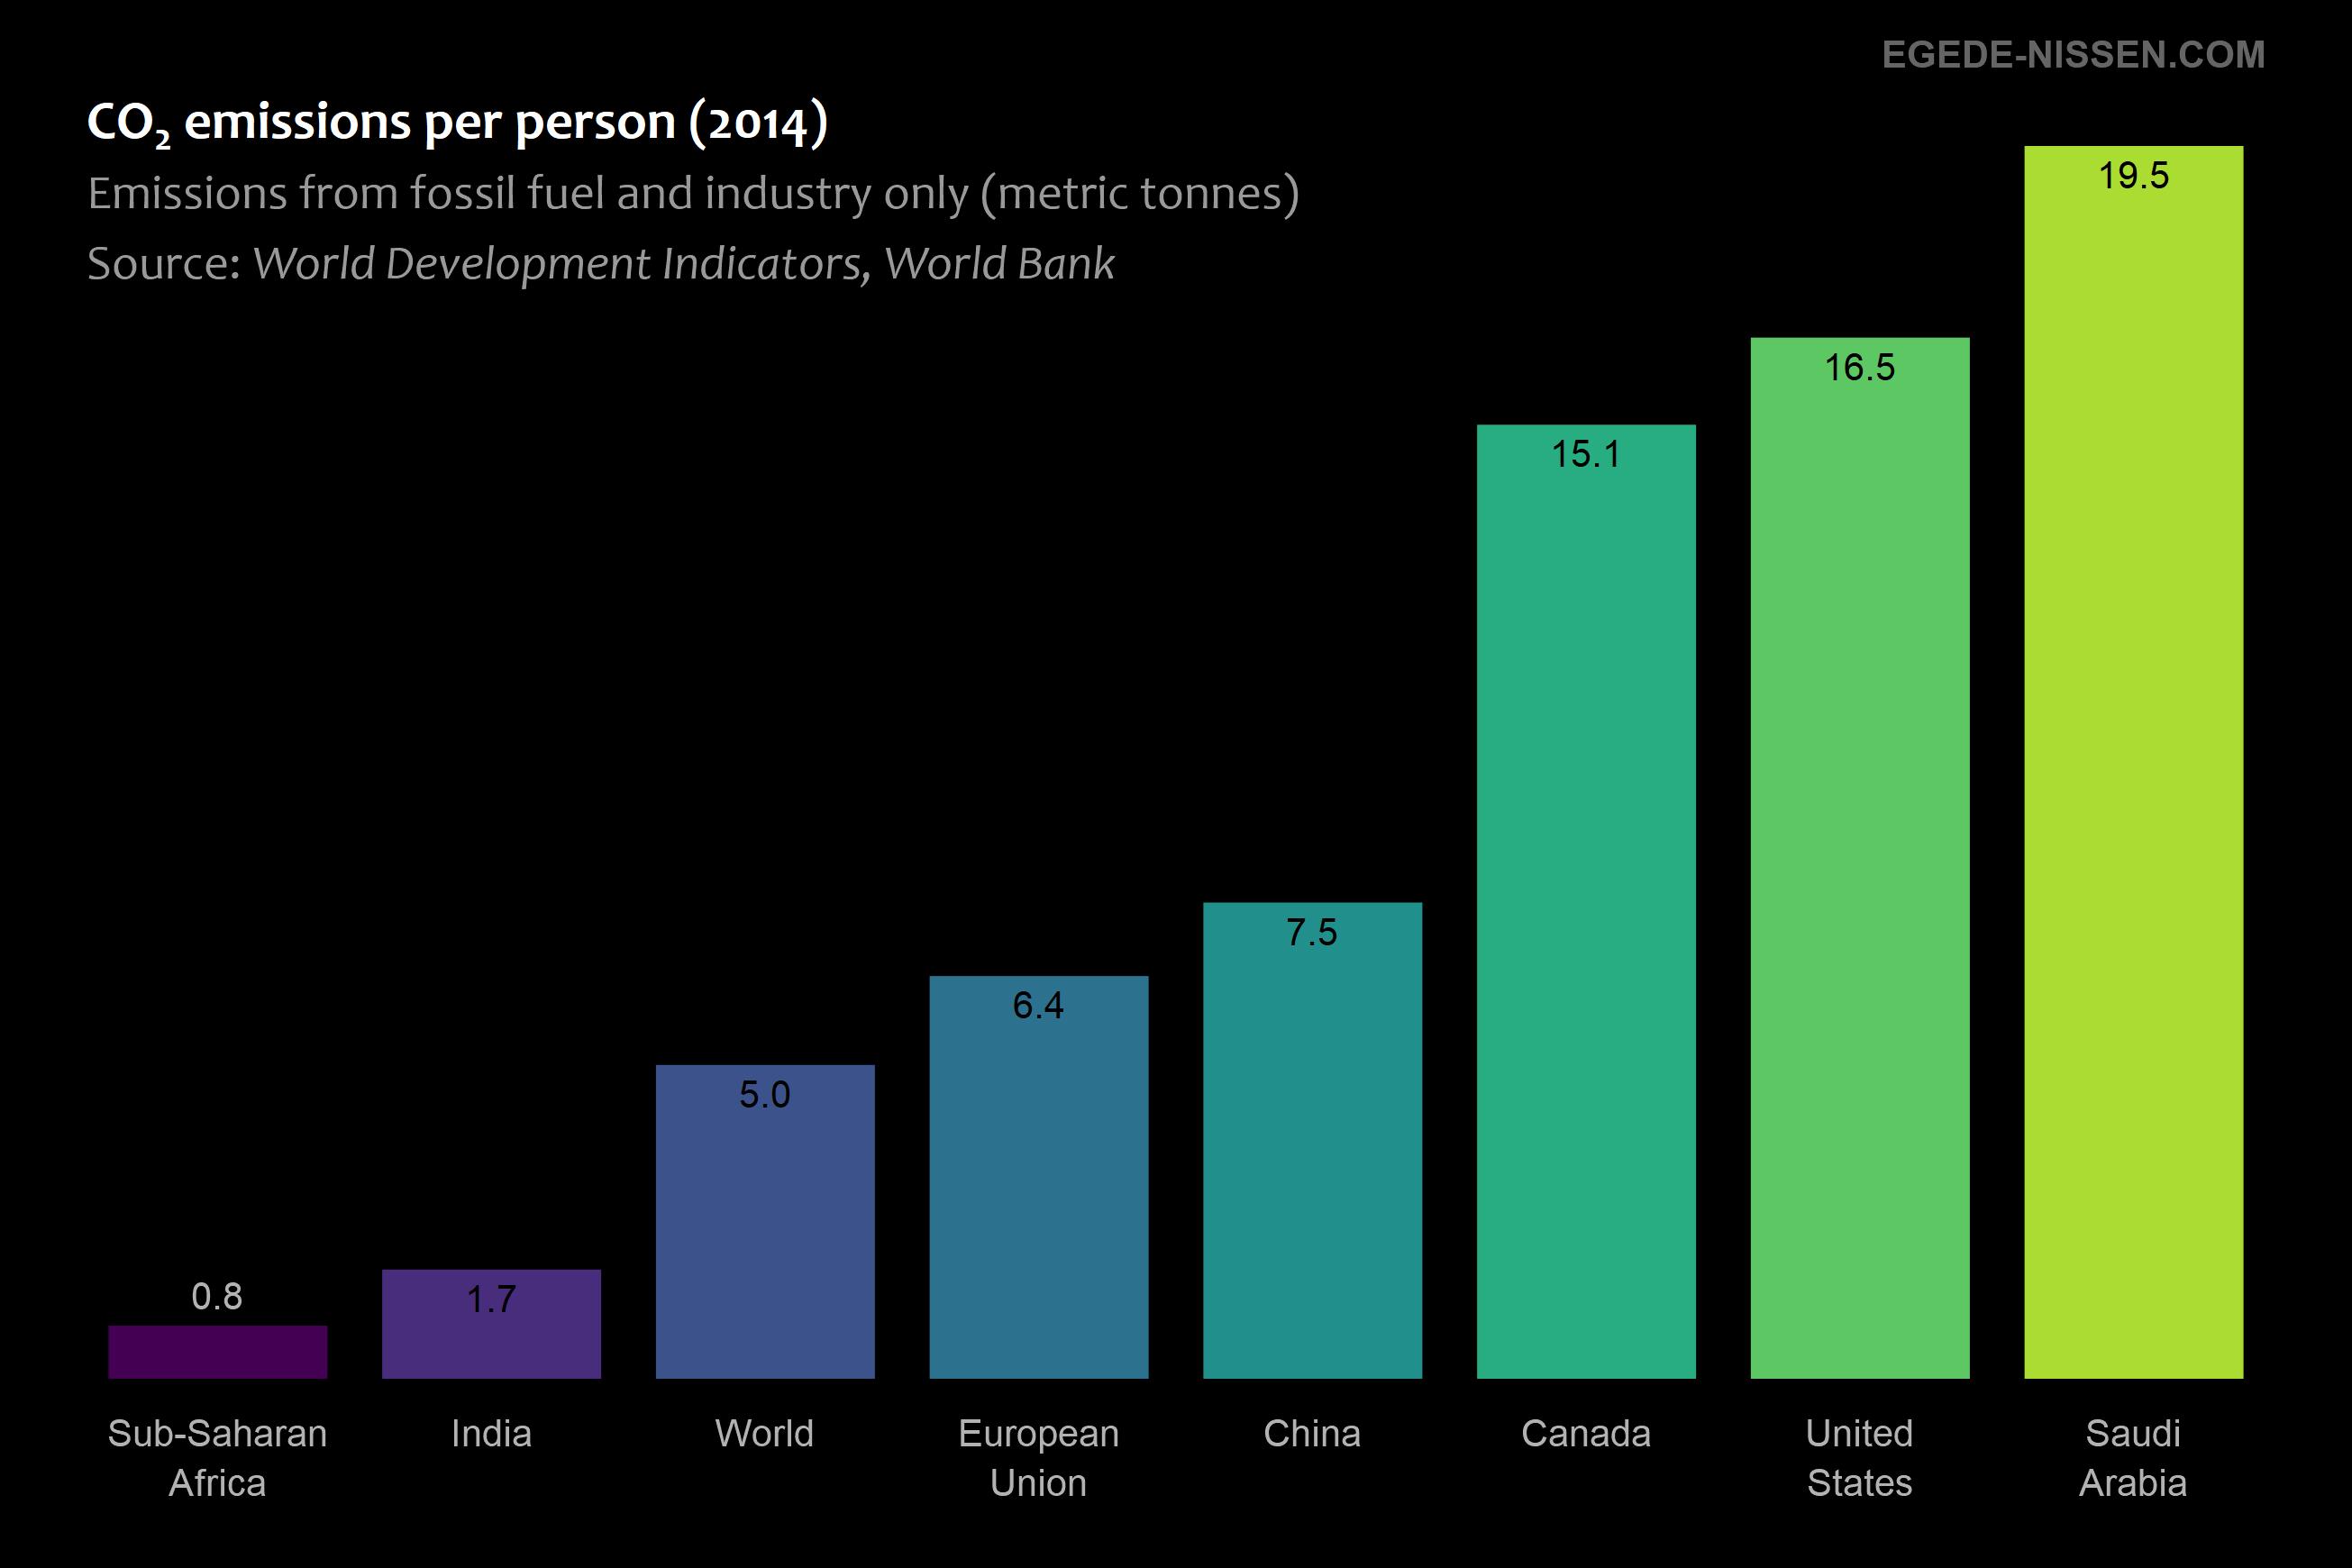 CO2 emissions per capita (fossil fuel)